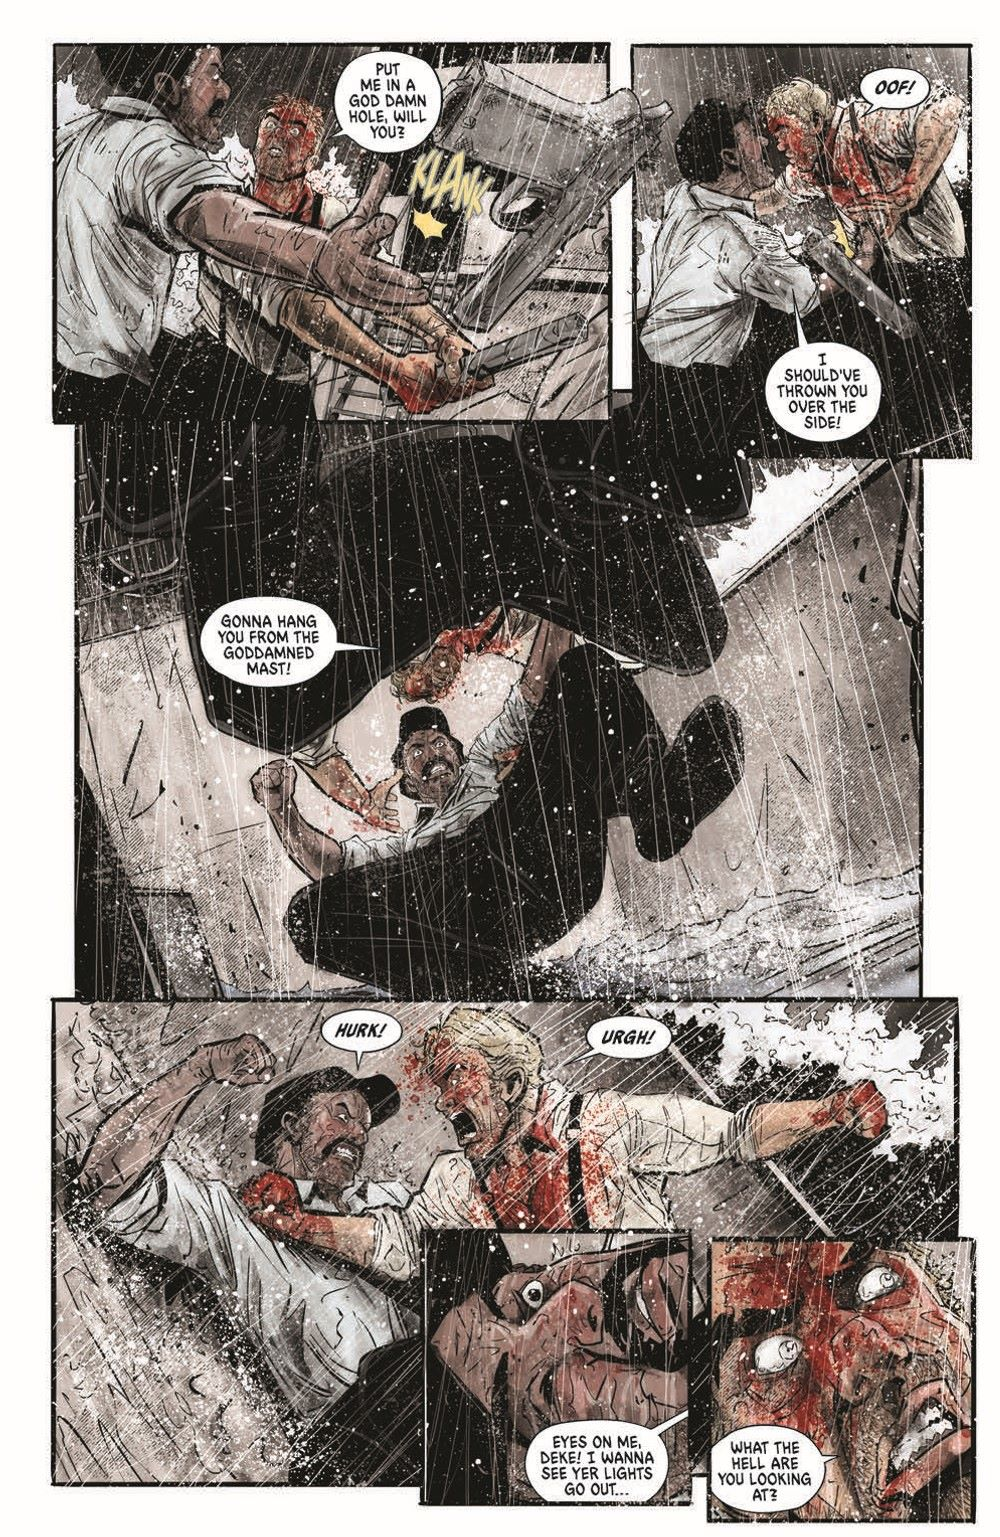 SeaOfSorrow05_pr-7 ComicList Previews: SEA OF SORROWS #5 (OF 5)